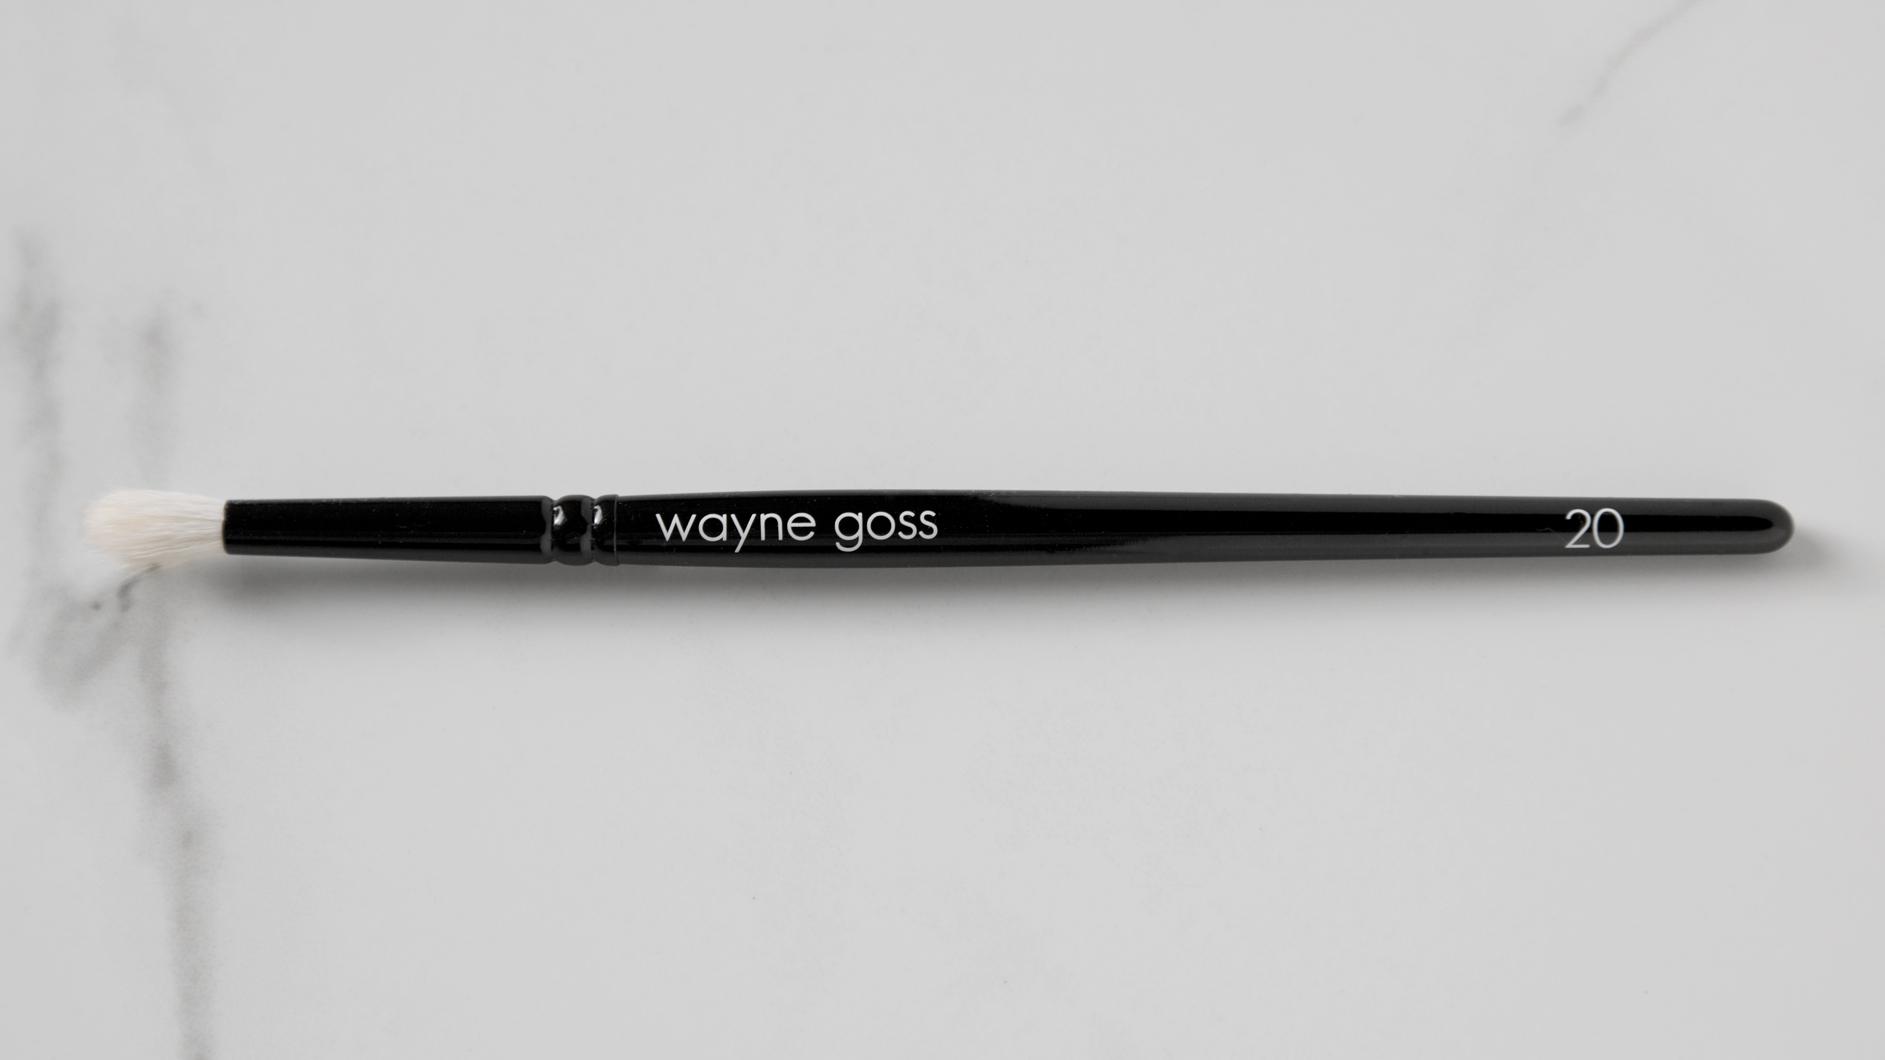 Wayne Goss Brush 20 Eye Shadow Smudging Brush $22